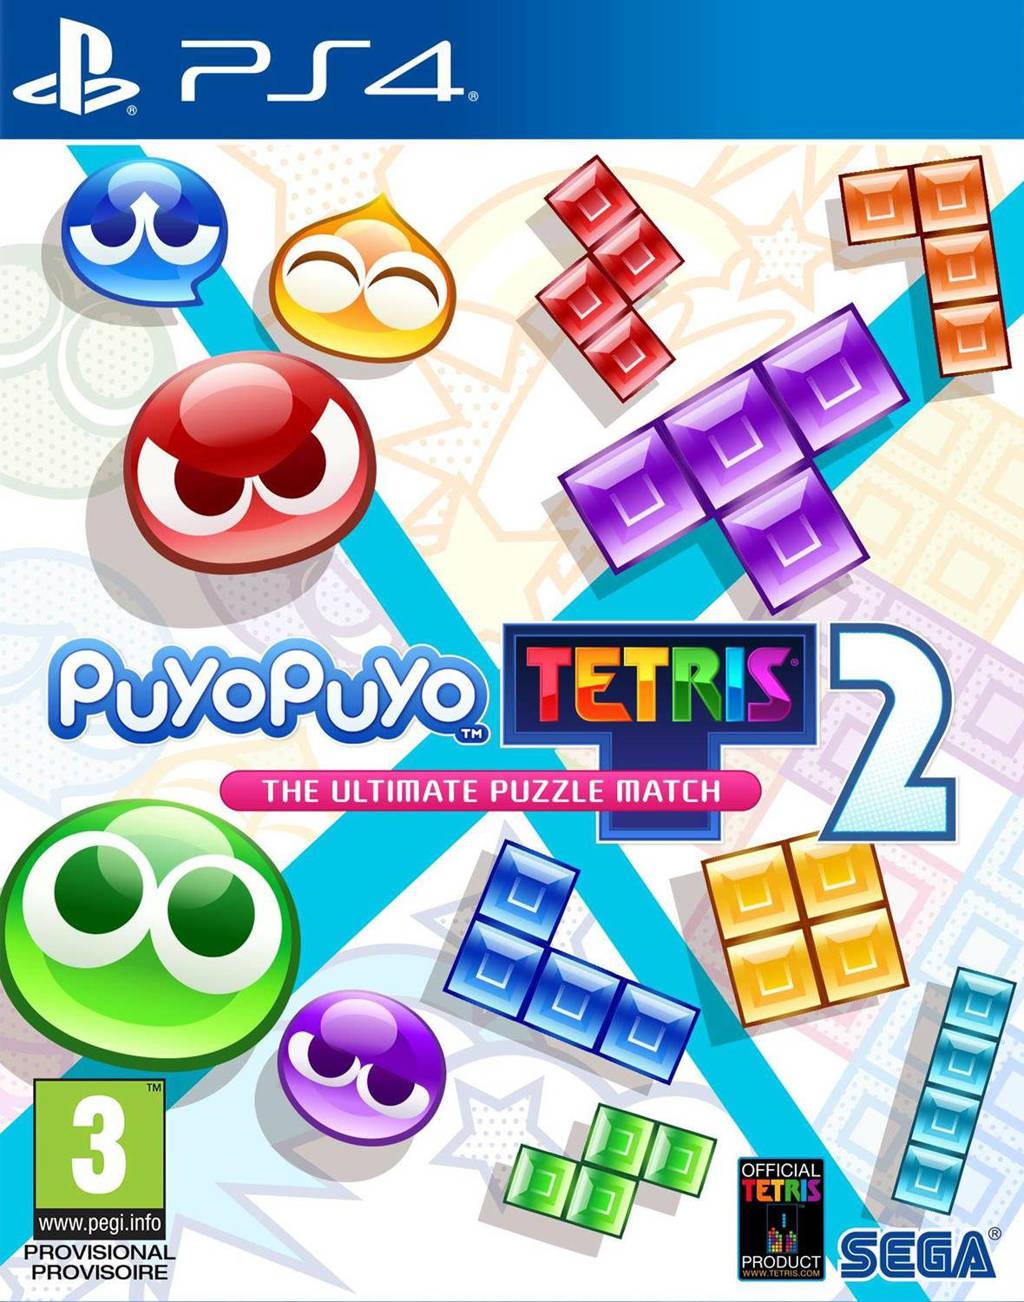 Puyo Puyo Tetris 2 (Launch edition) (PlayStation 4)